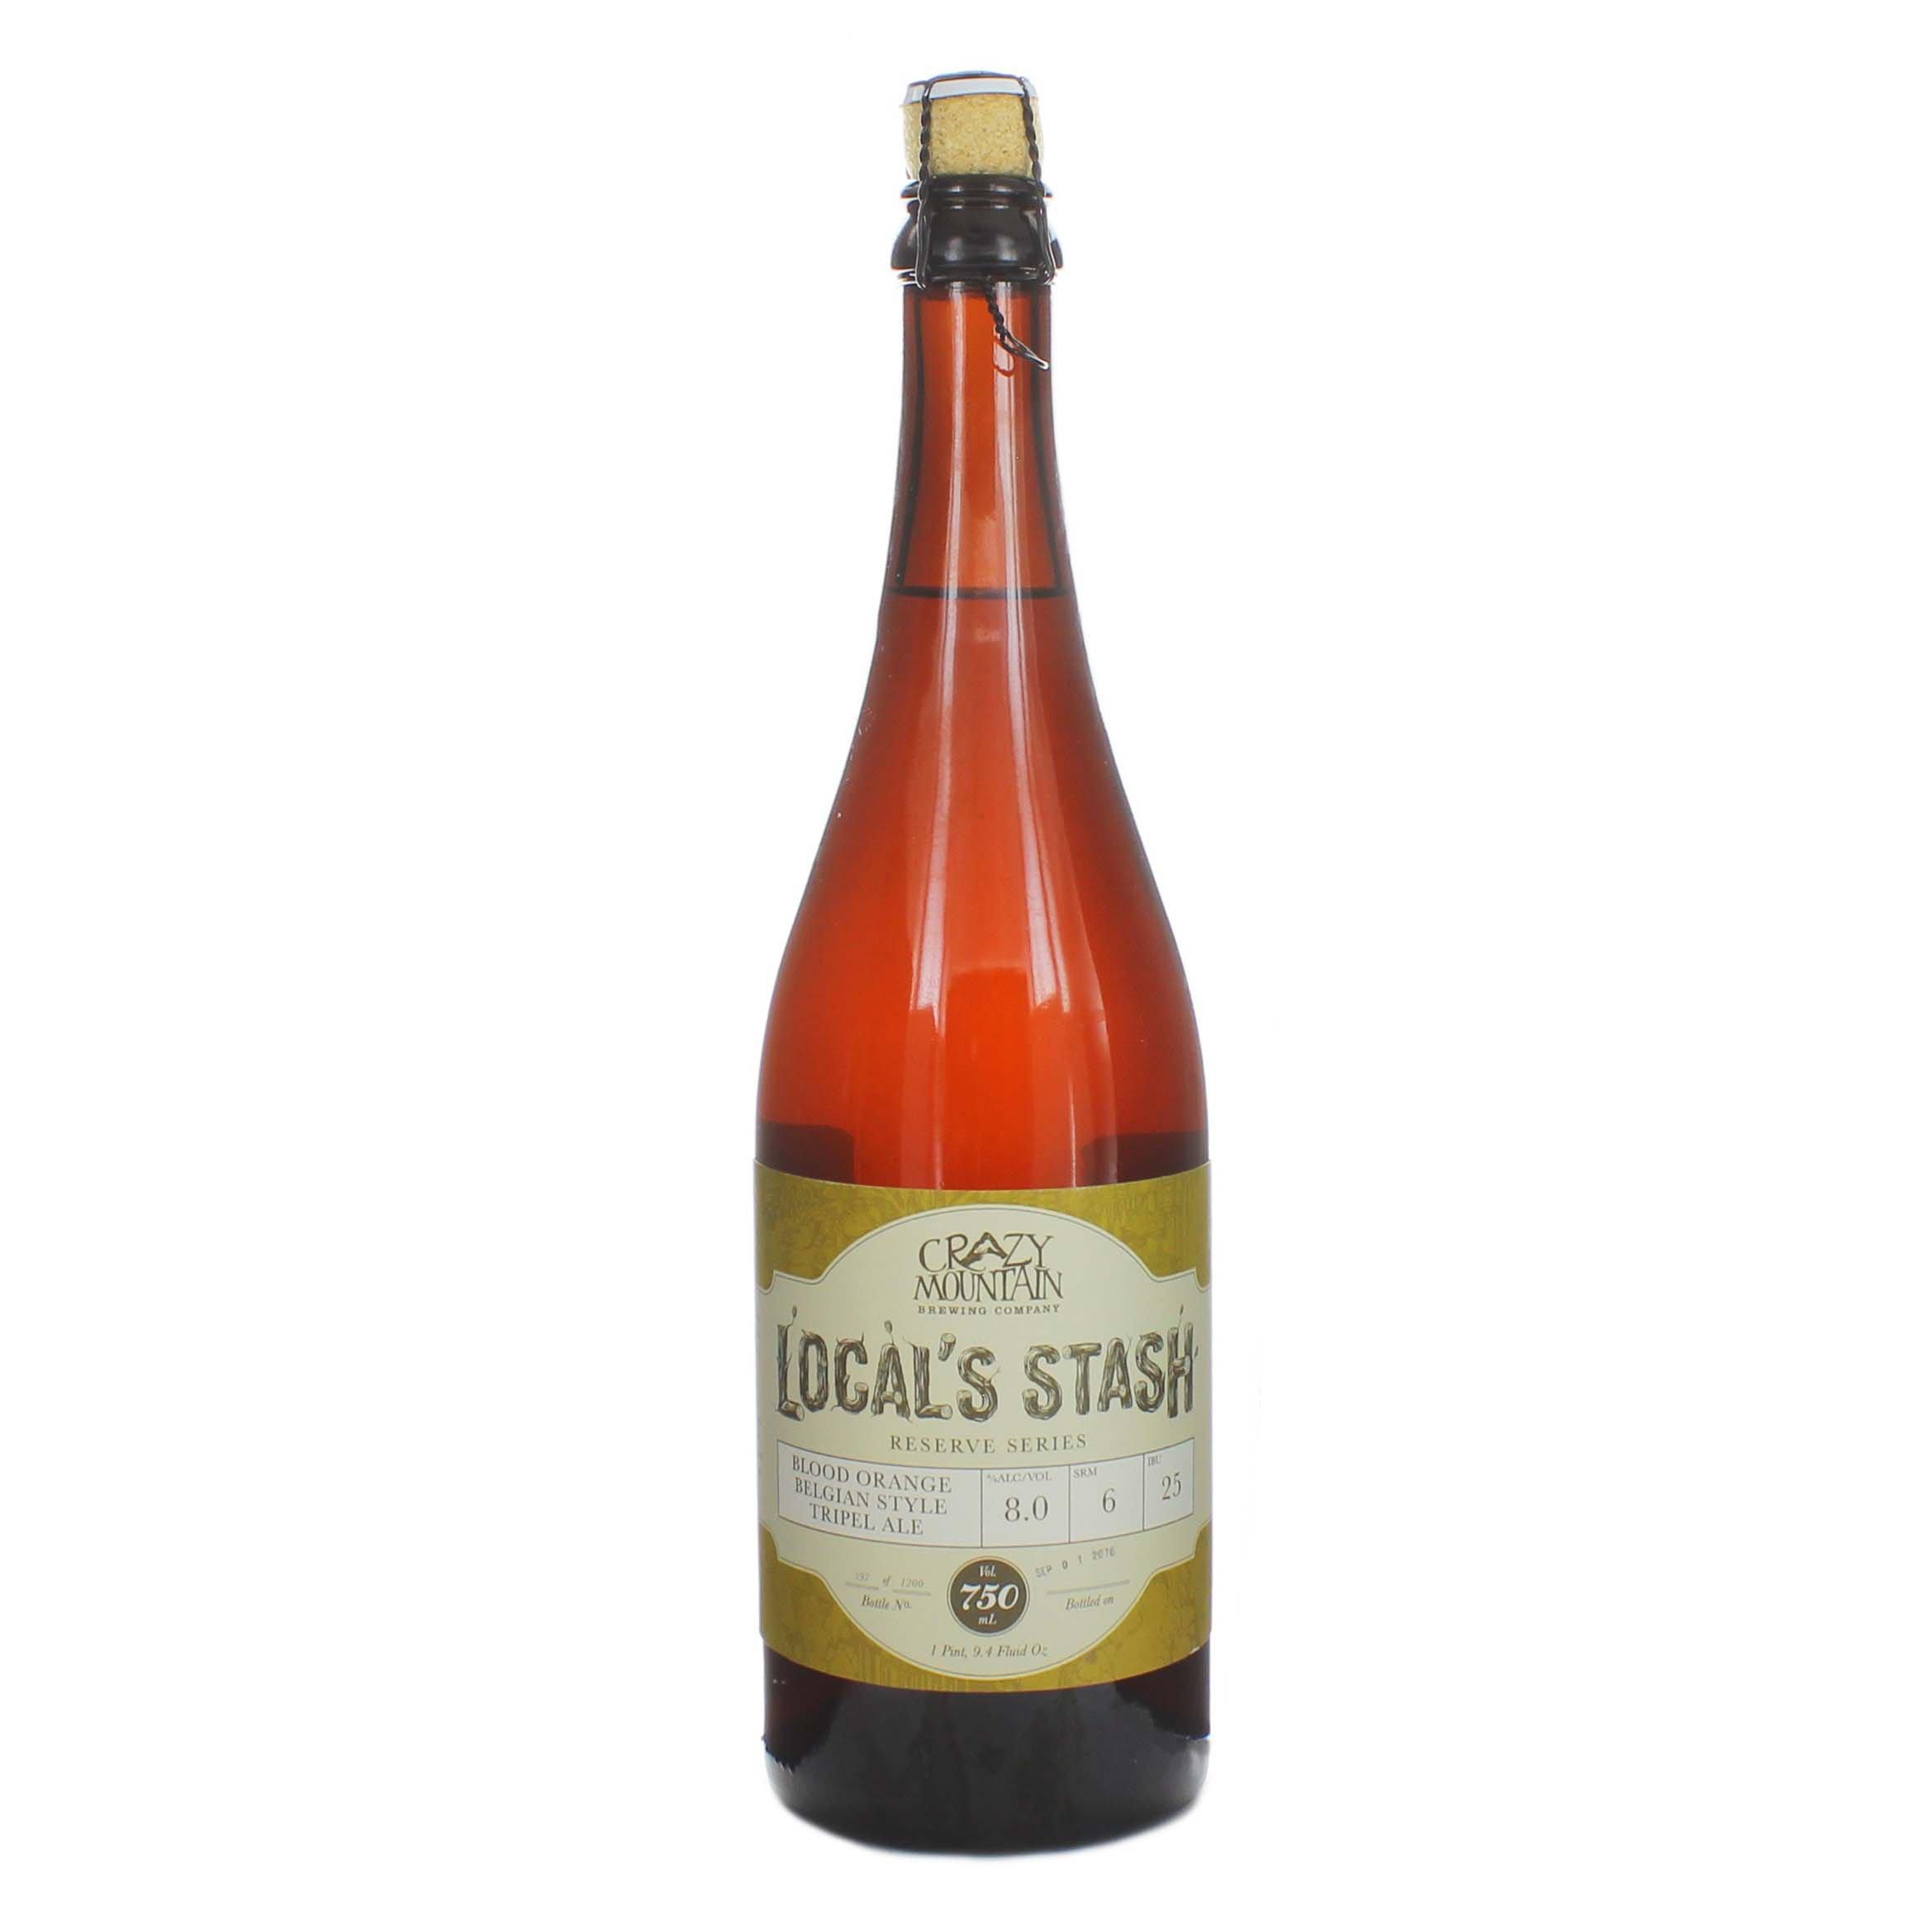 Crazy Mountain Locals Stash Triple India Pale Ale